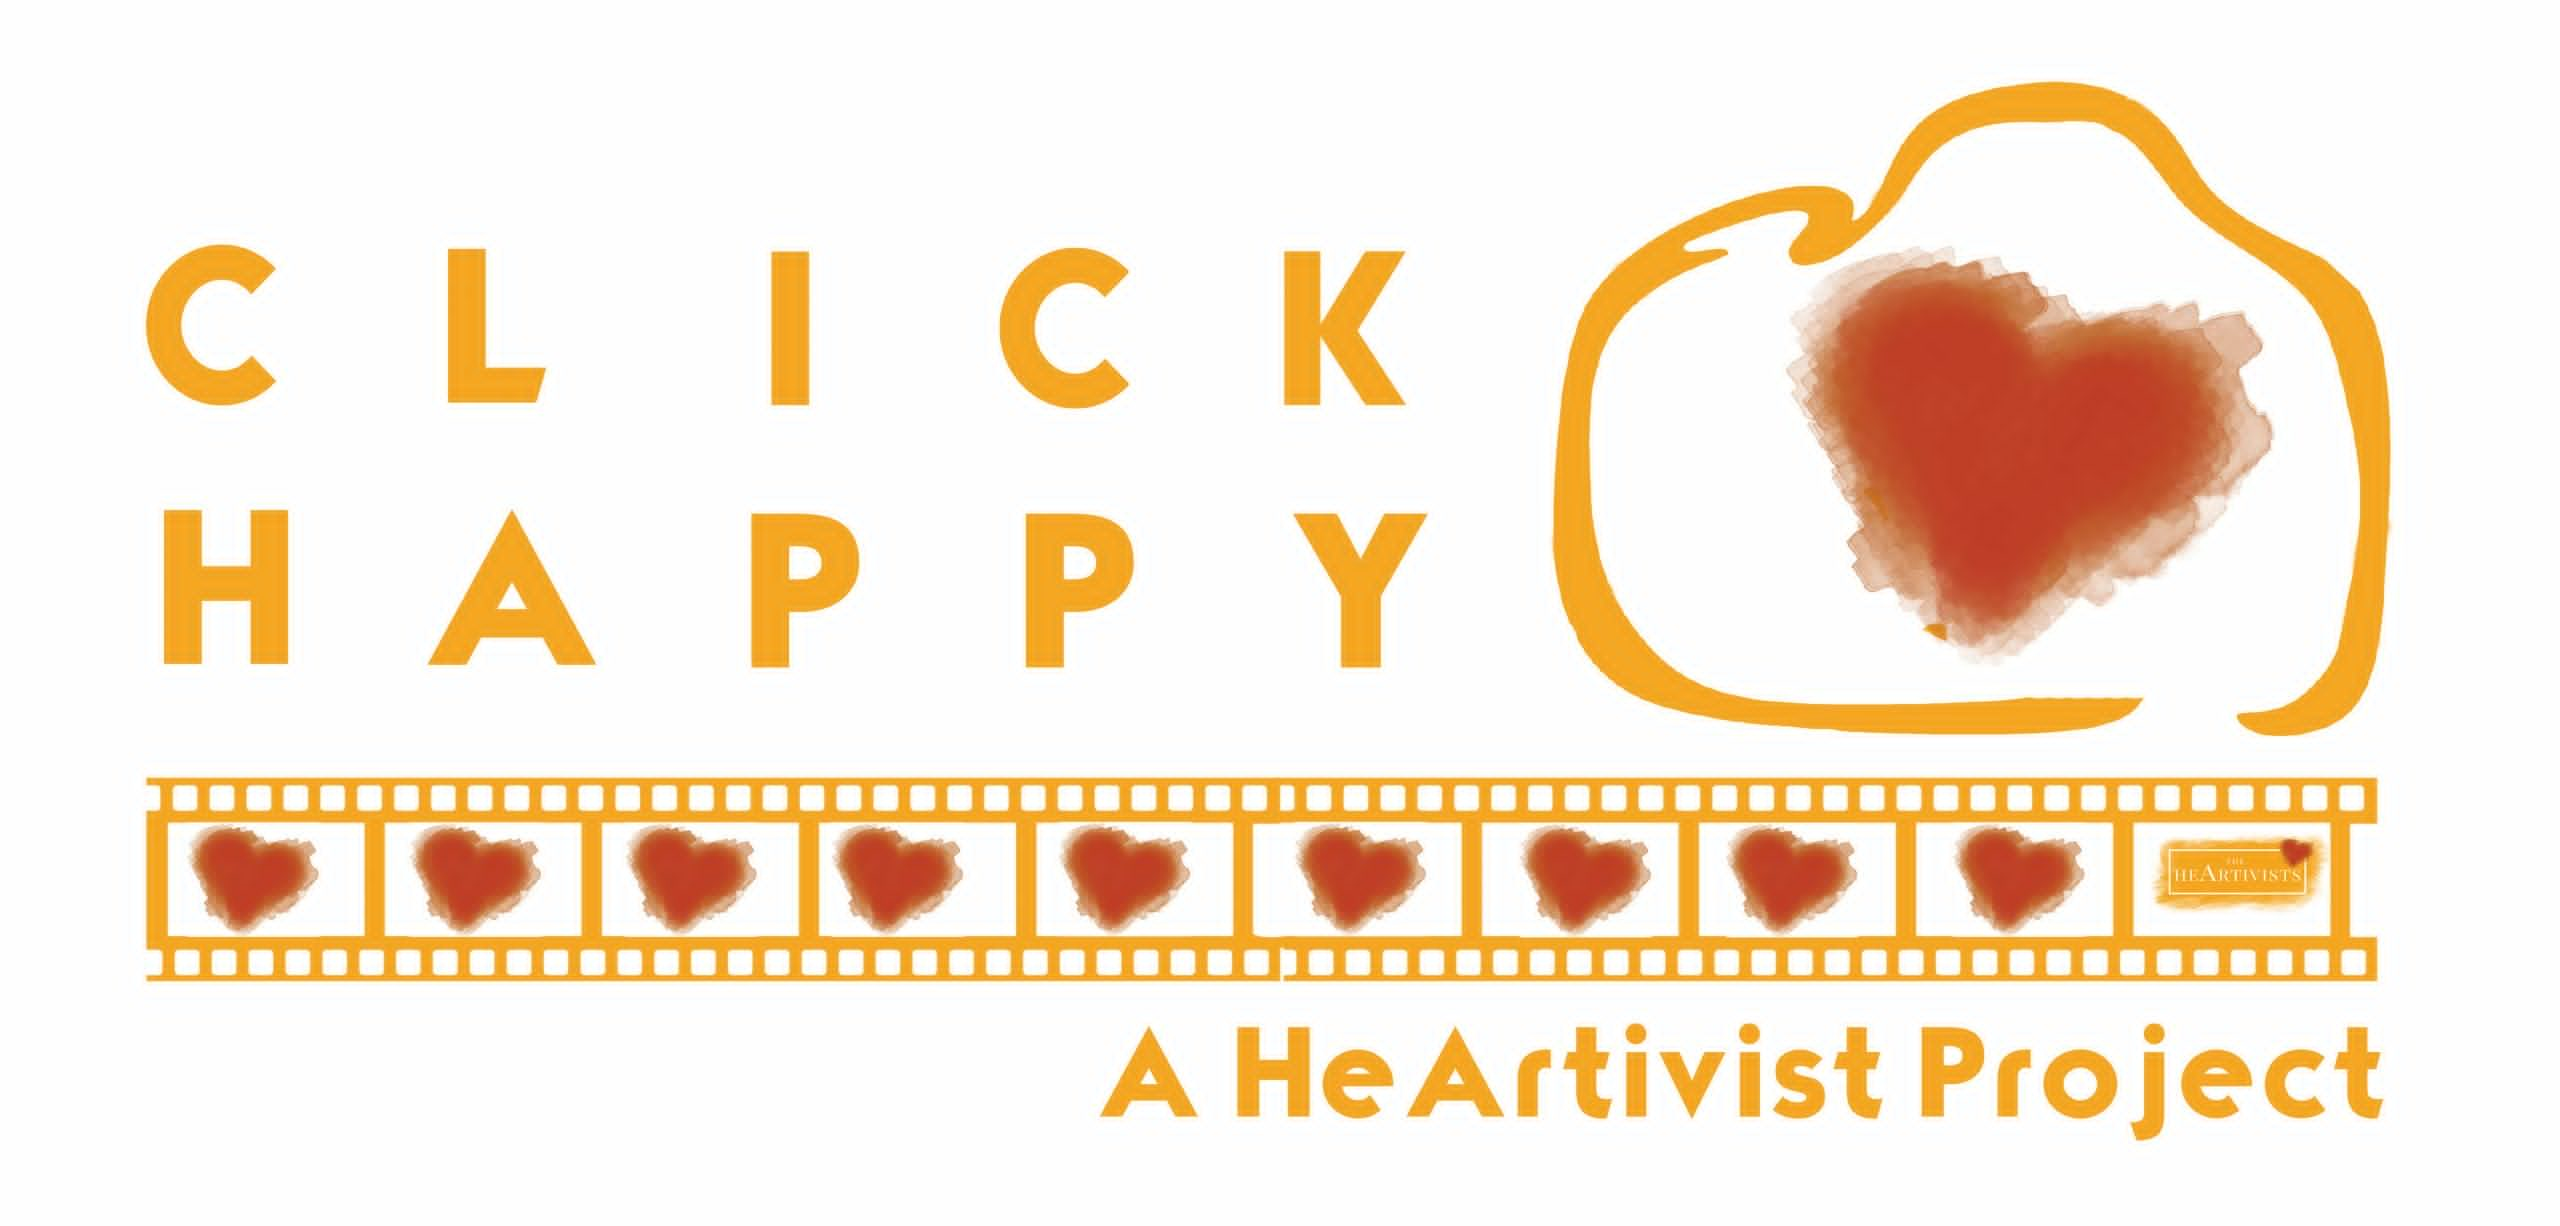 CLick Happy Logo